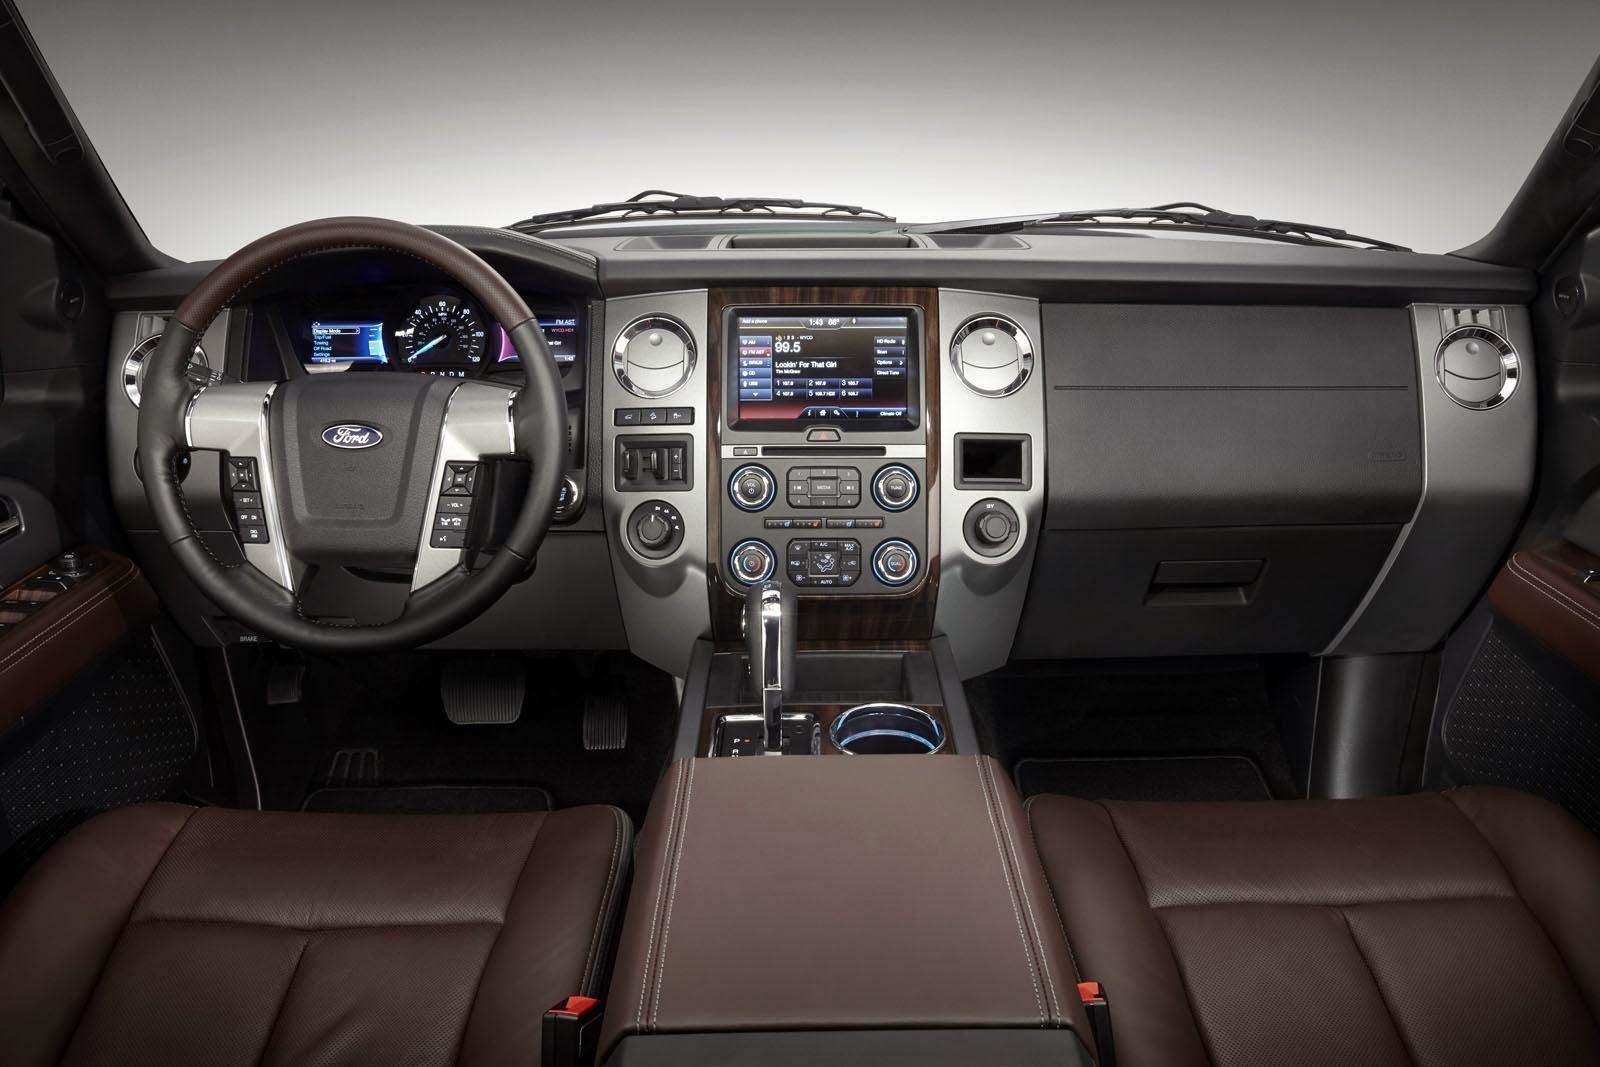 [Resim: Ford+Expedition+2.jpg]